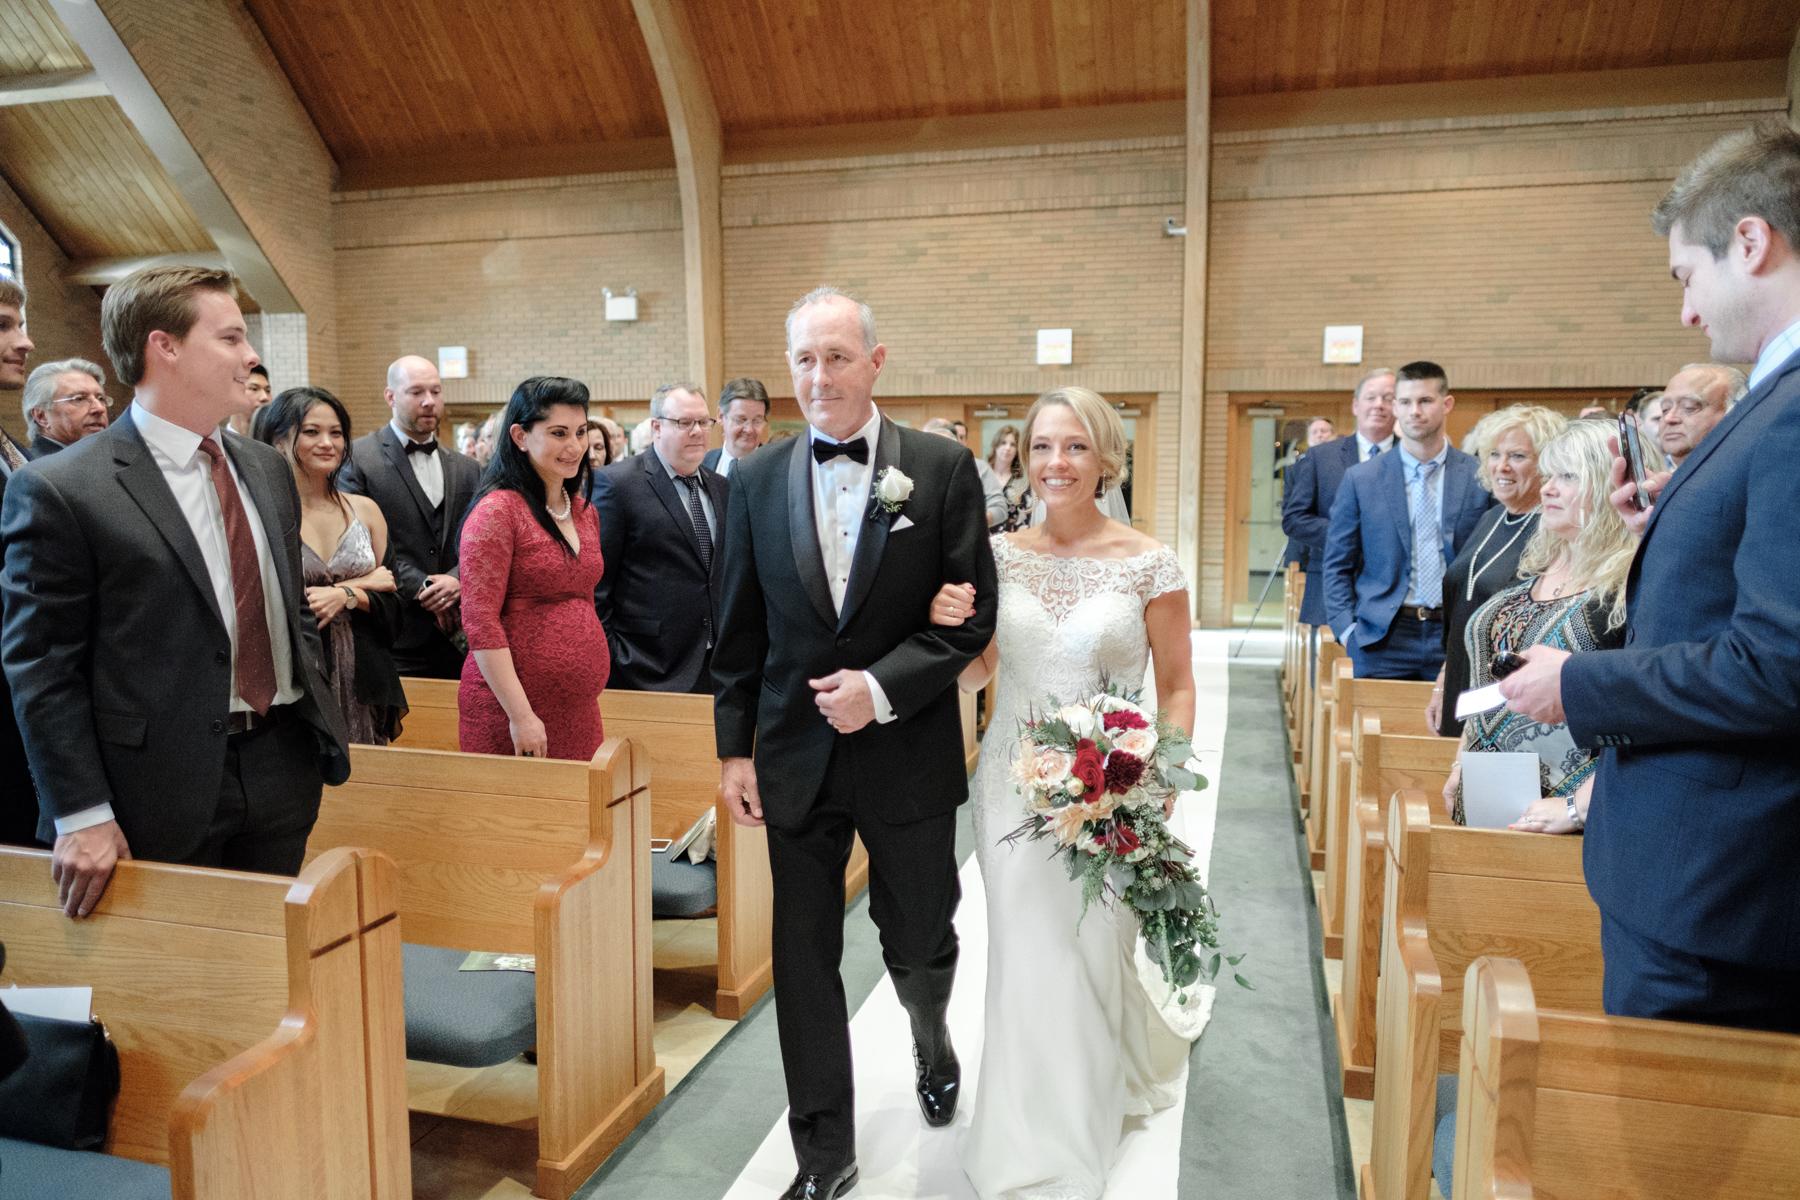 2017_BAP_KalliMatt_Gleneagles_CountryClub_Lemont_Wedding-36.jpg